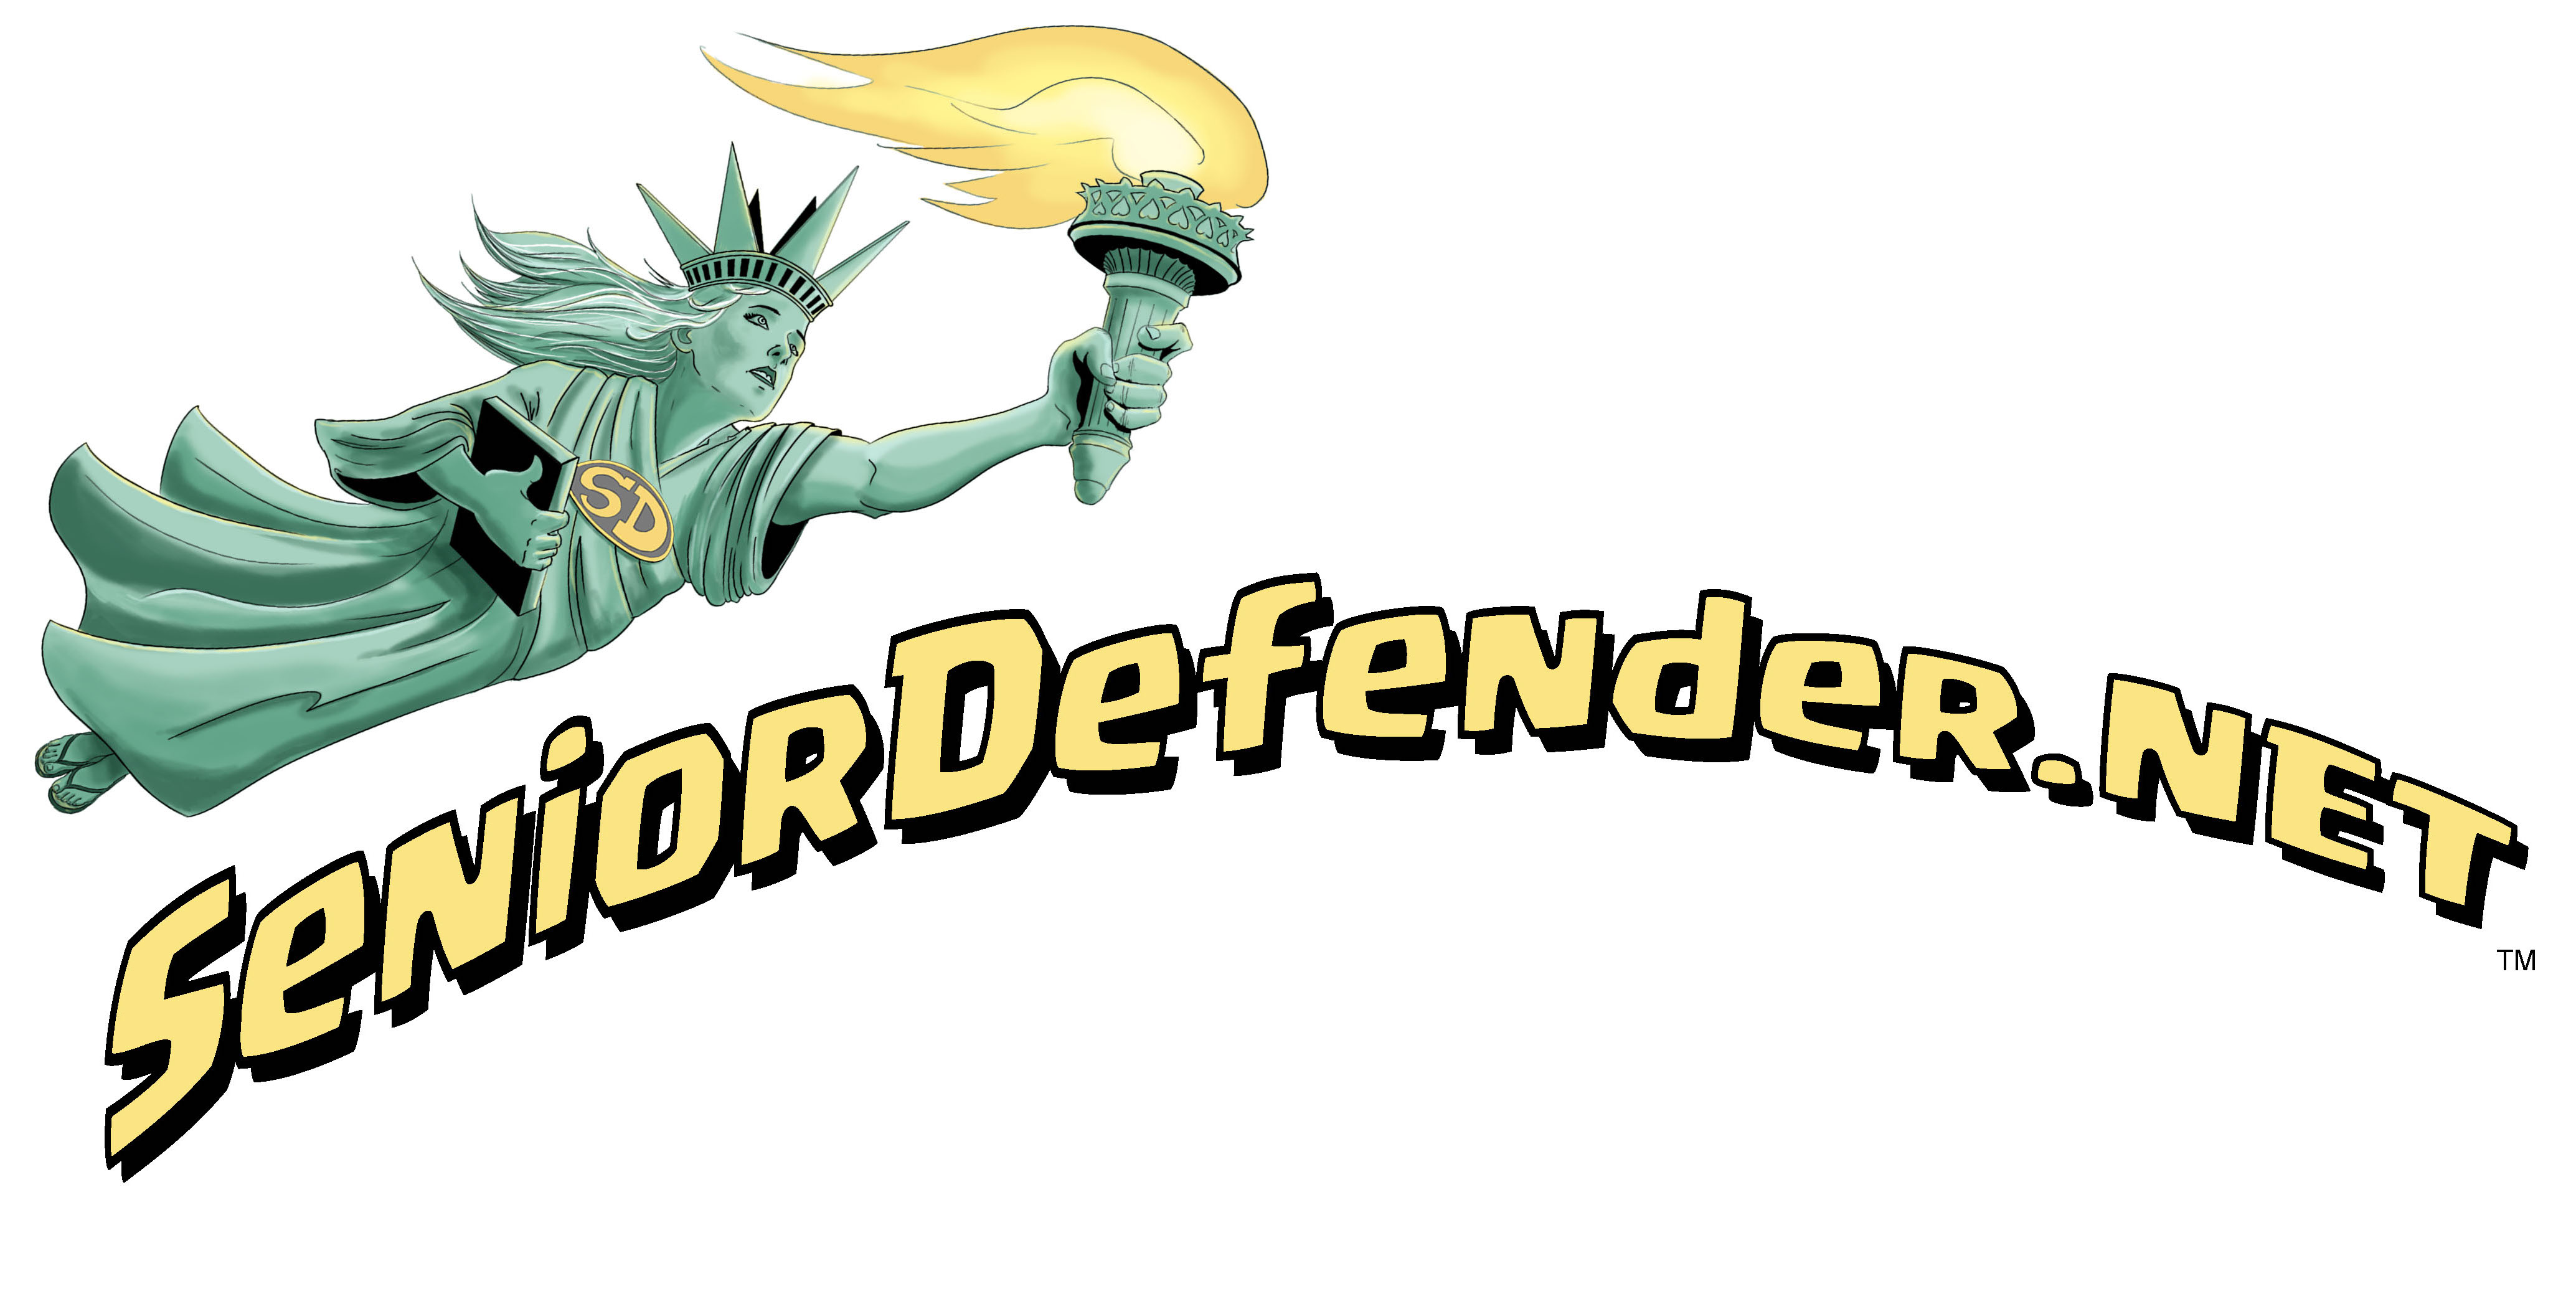 Defender of Senior Citizens